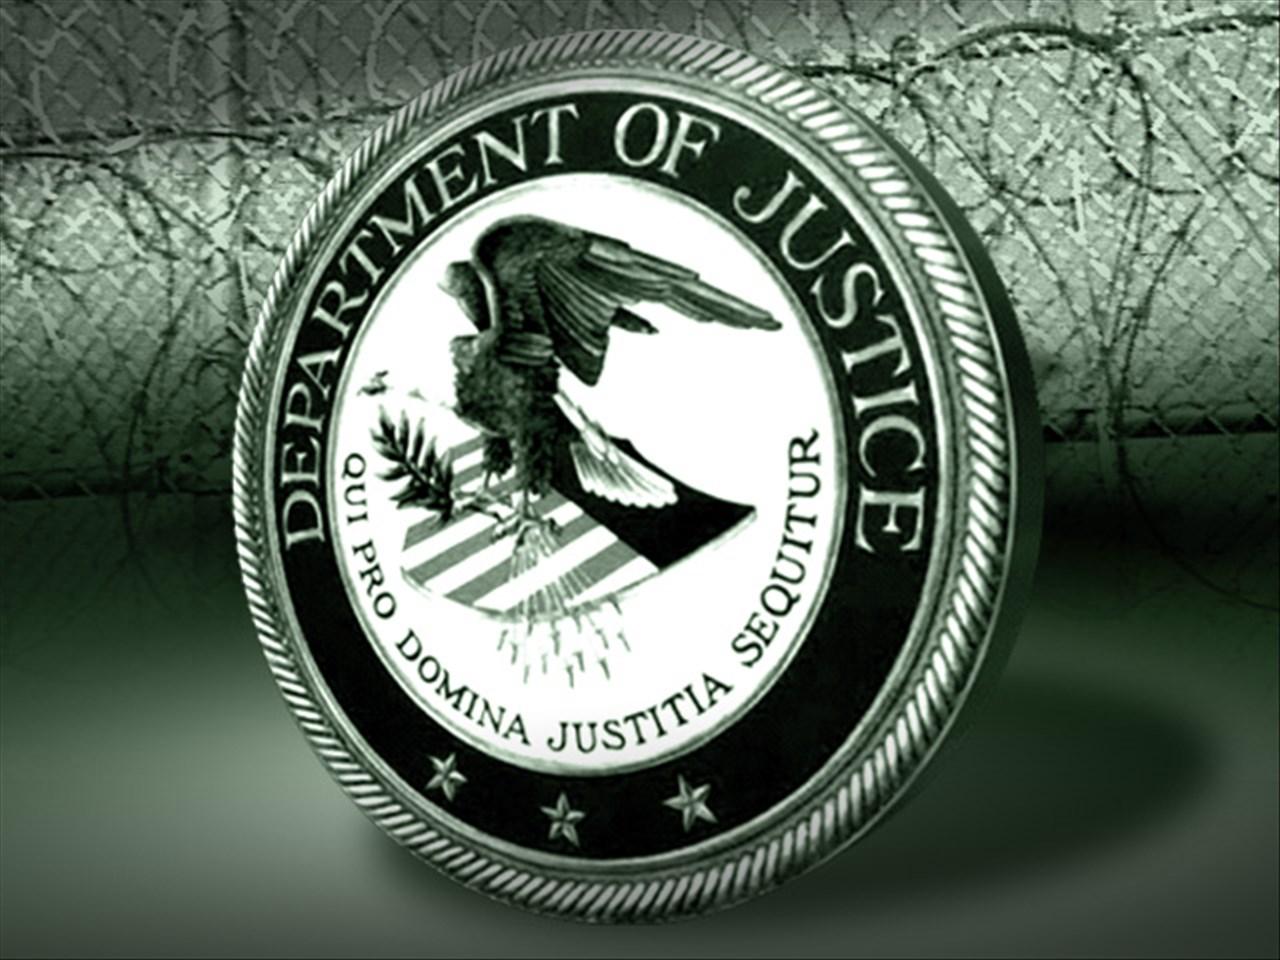 Justice Reinvestment OTS_1535066775928.jpg.jpg